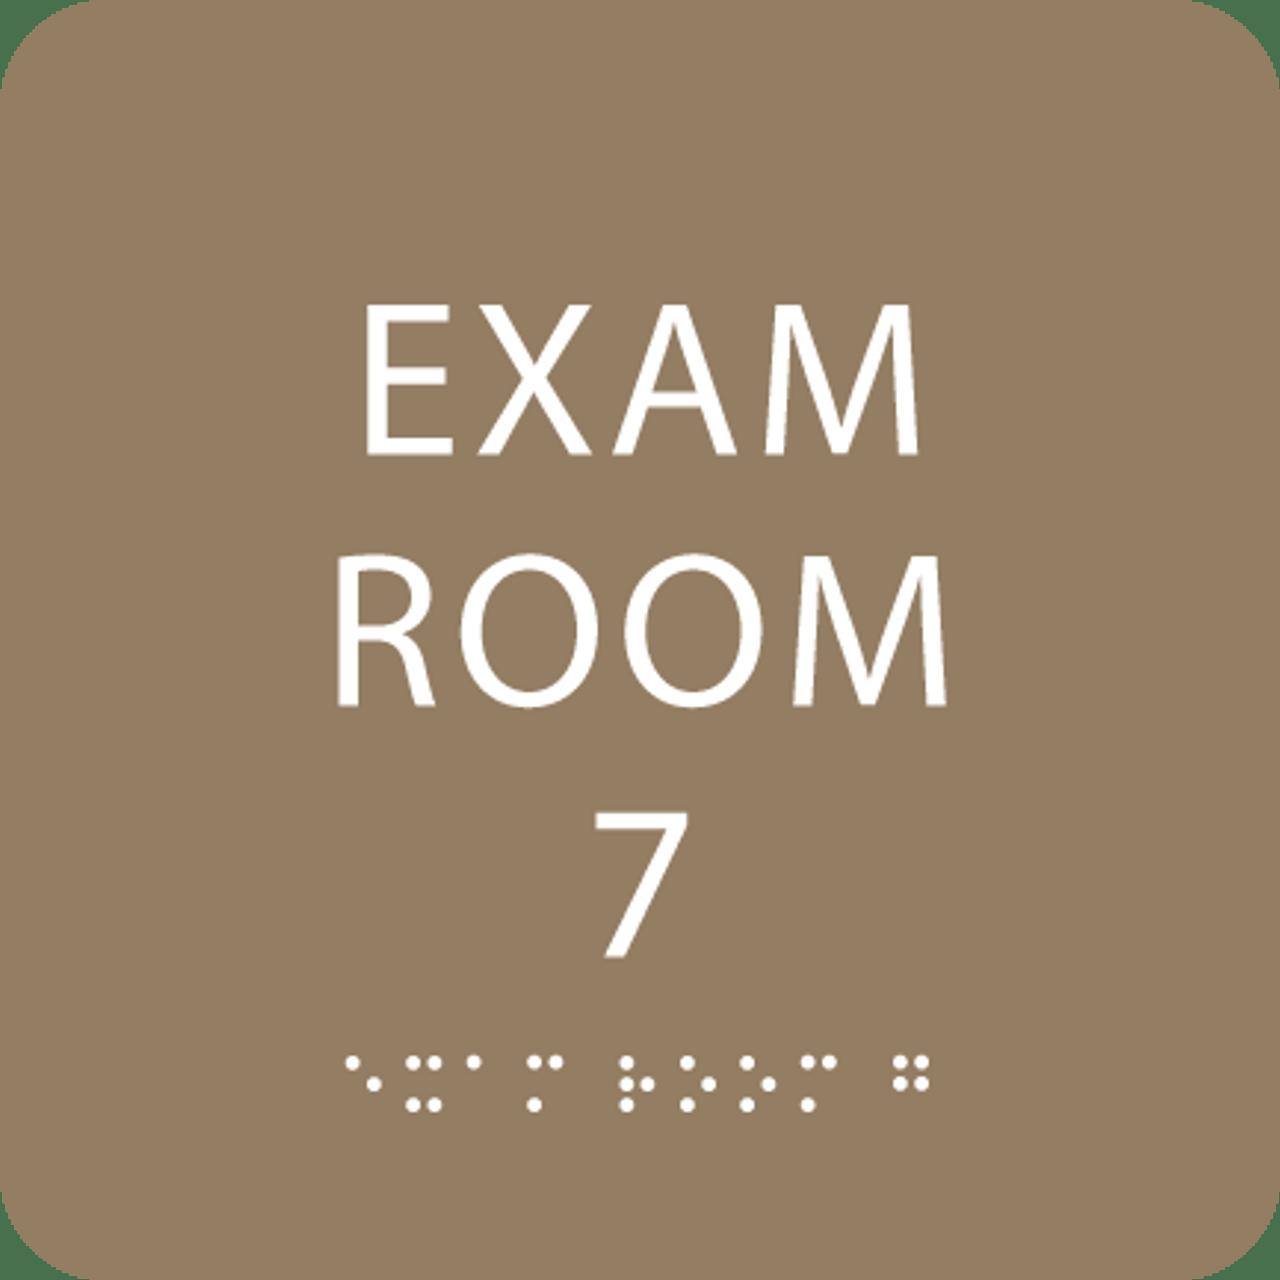 Light Brown Exam Room 7 Sign w/ ADA Braille